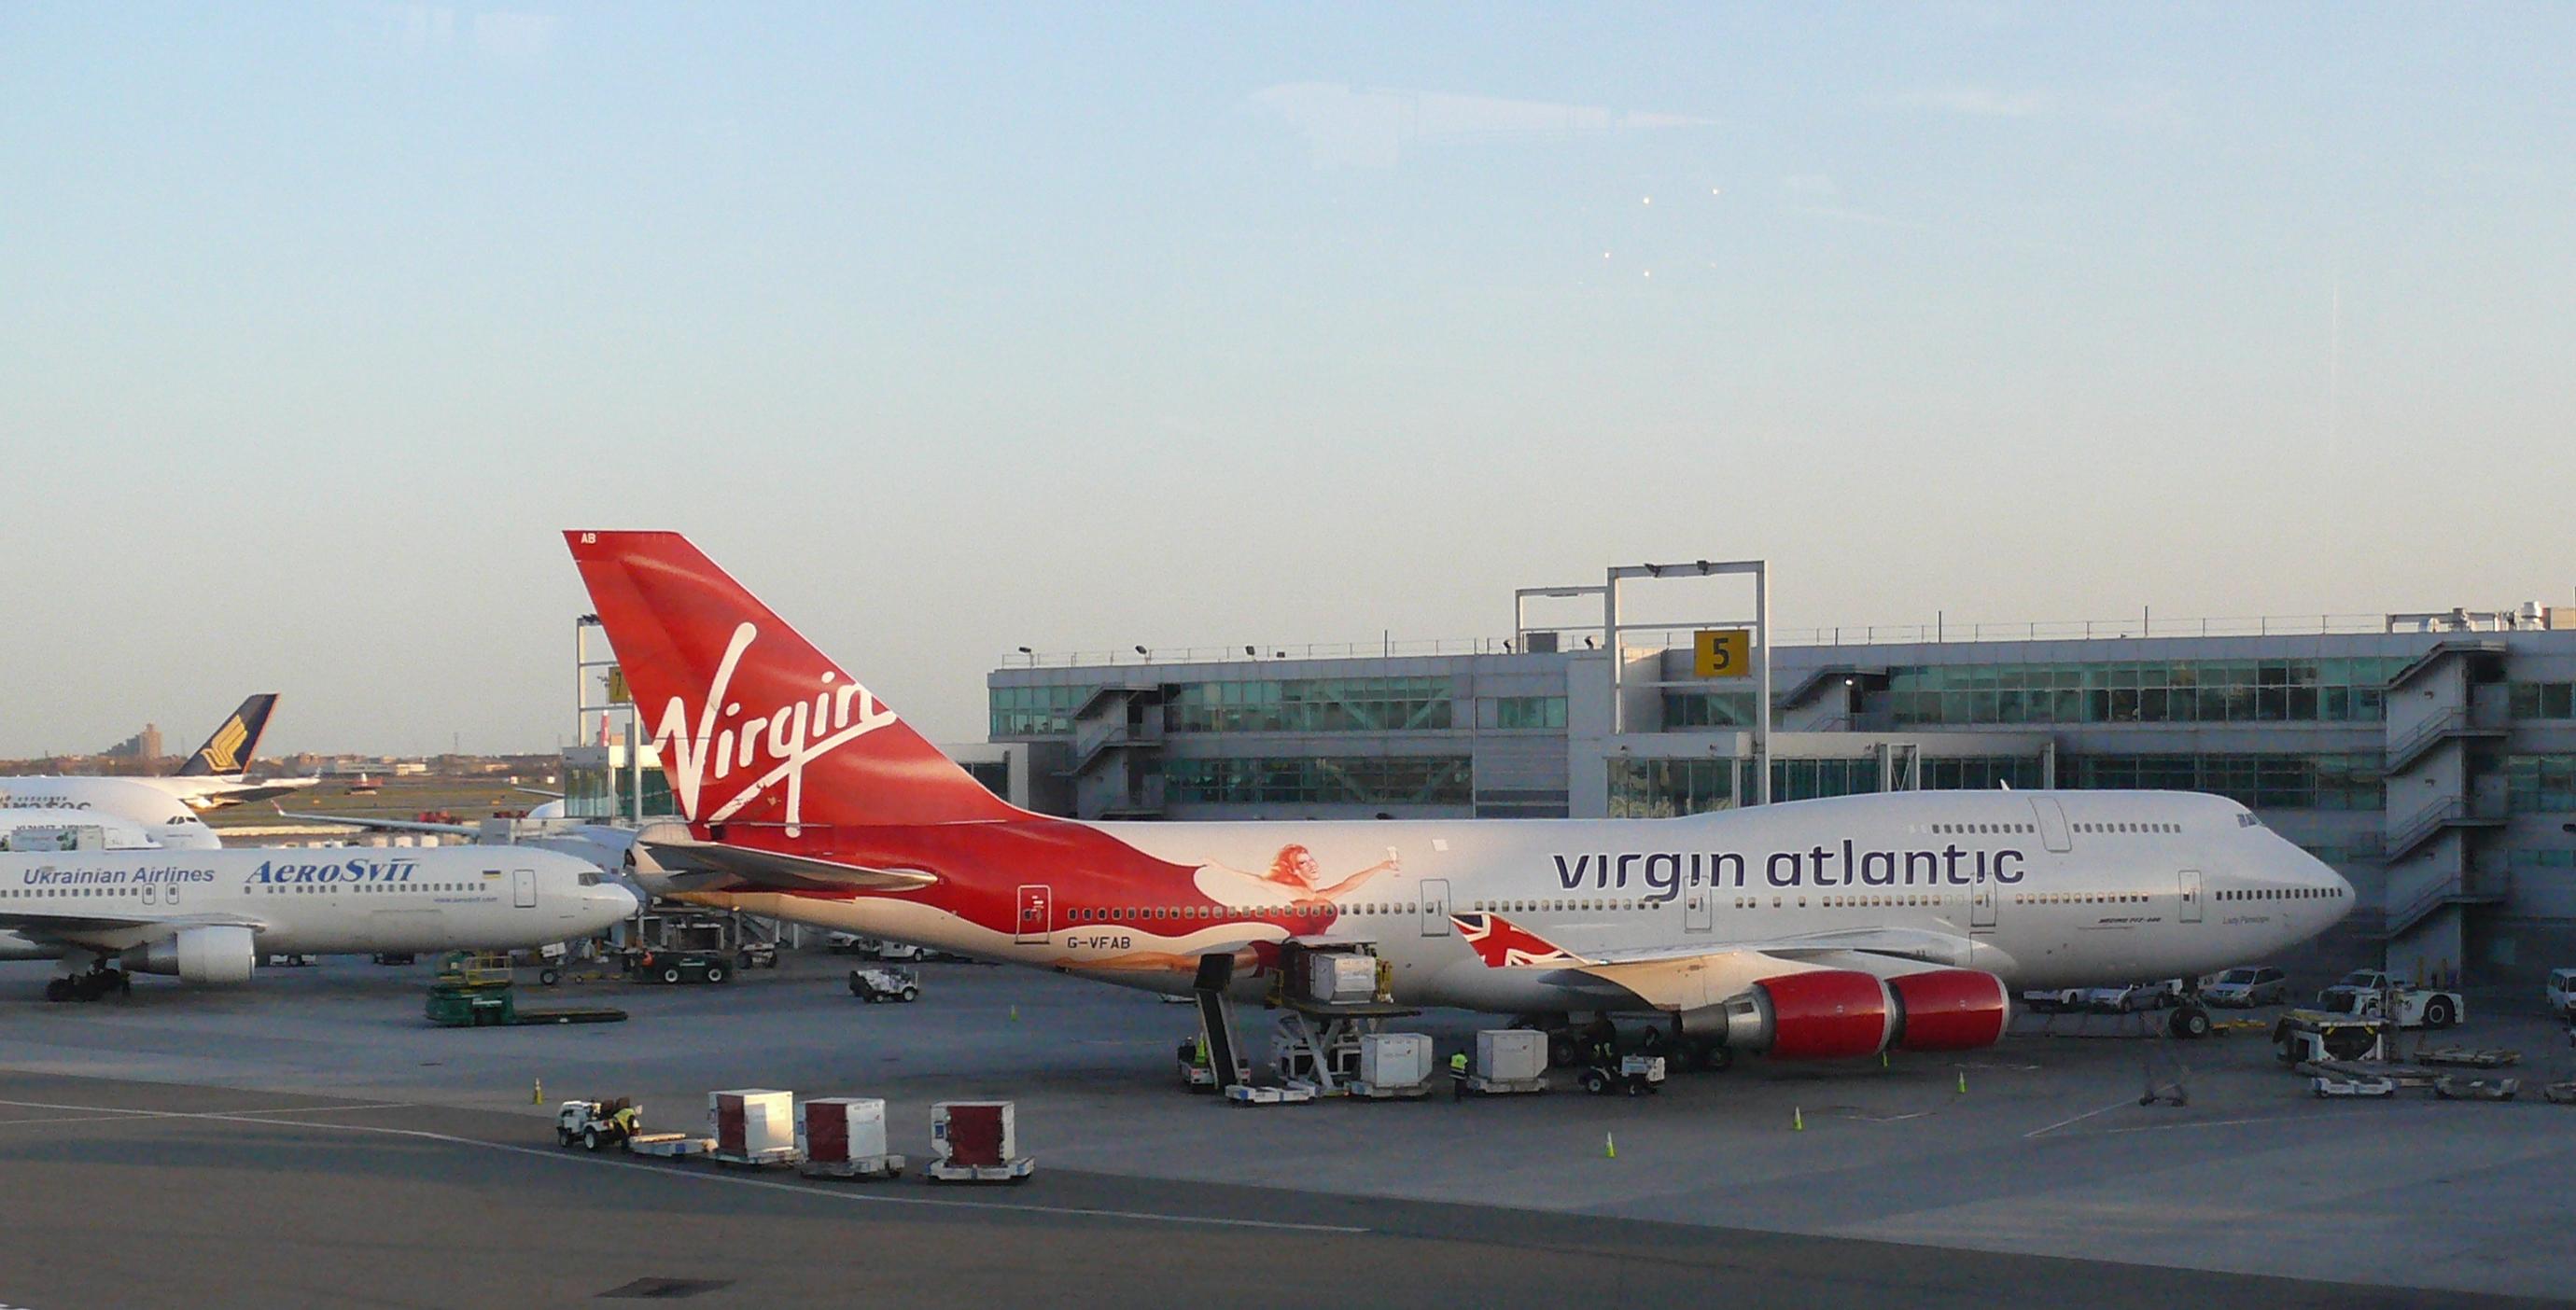 executive summary virgin atlantic A summary of airline news from the virgin atlantic virgin atlantic cabin crew salary and the new a350-1000 virgin atlantic cabin crew embark on a 12.